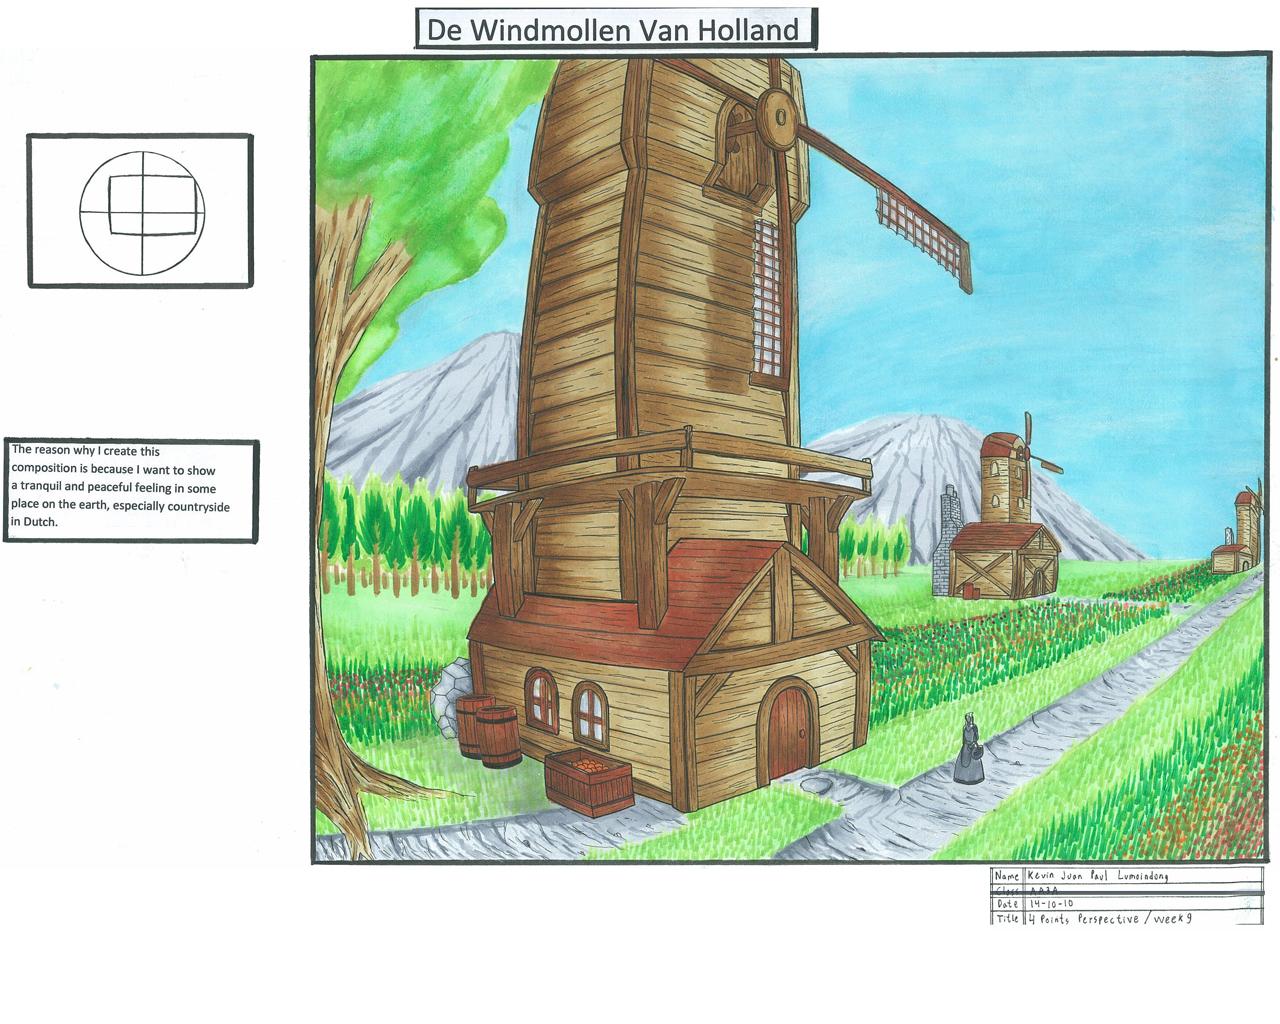 Windmollen Van Holland by JPL-Animation